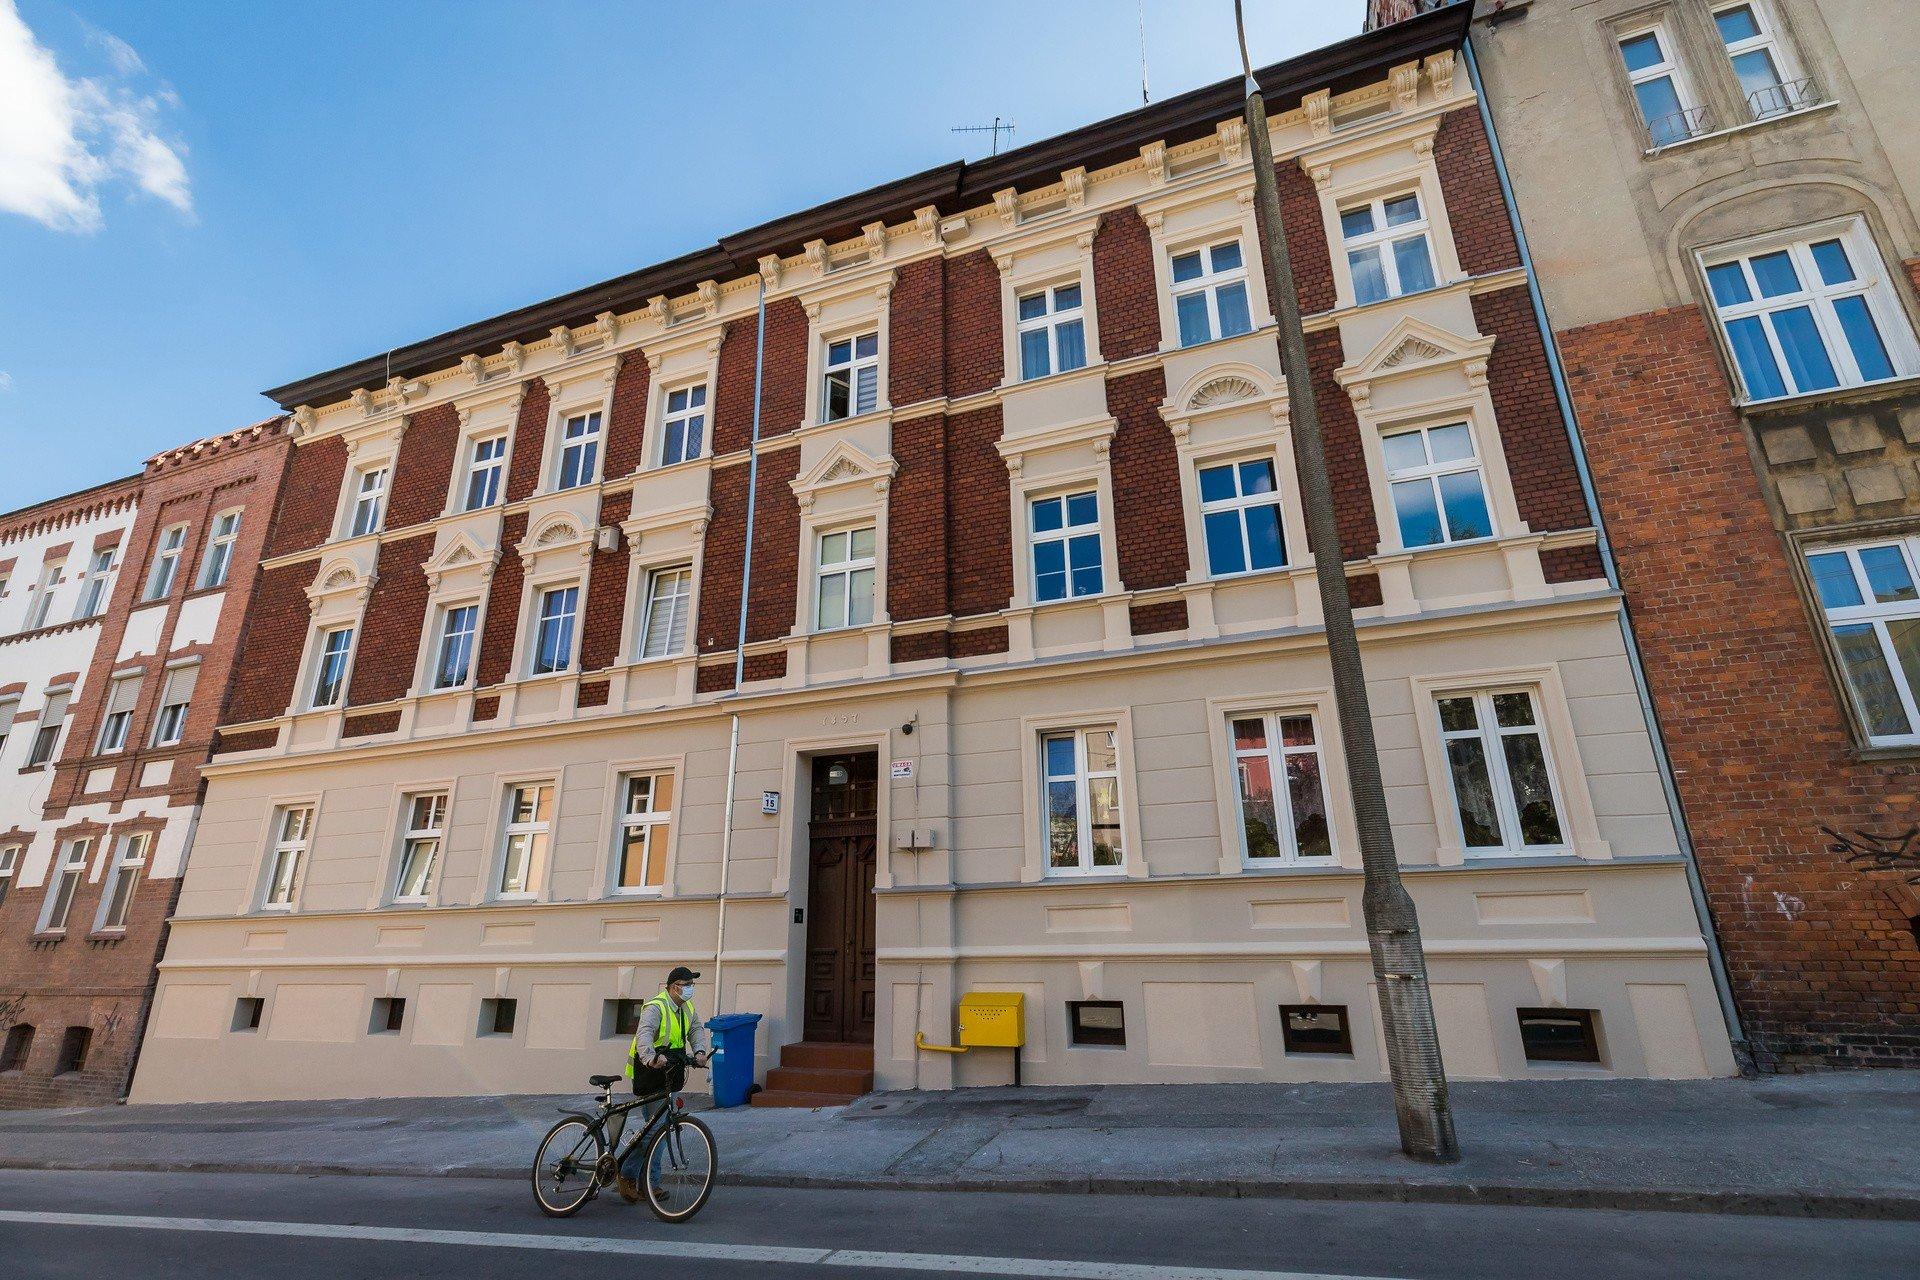 Mieszkania 3 pokojowe Koronowo - vemale.club